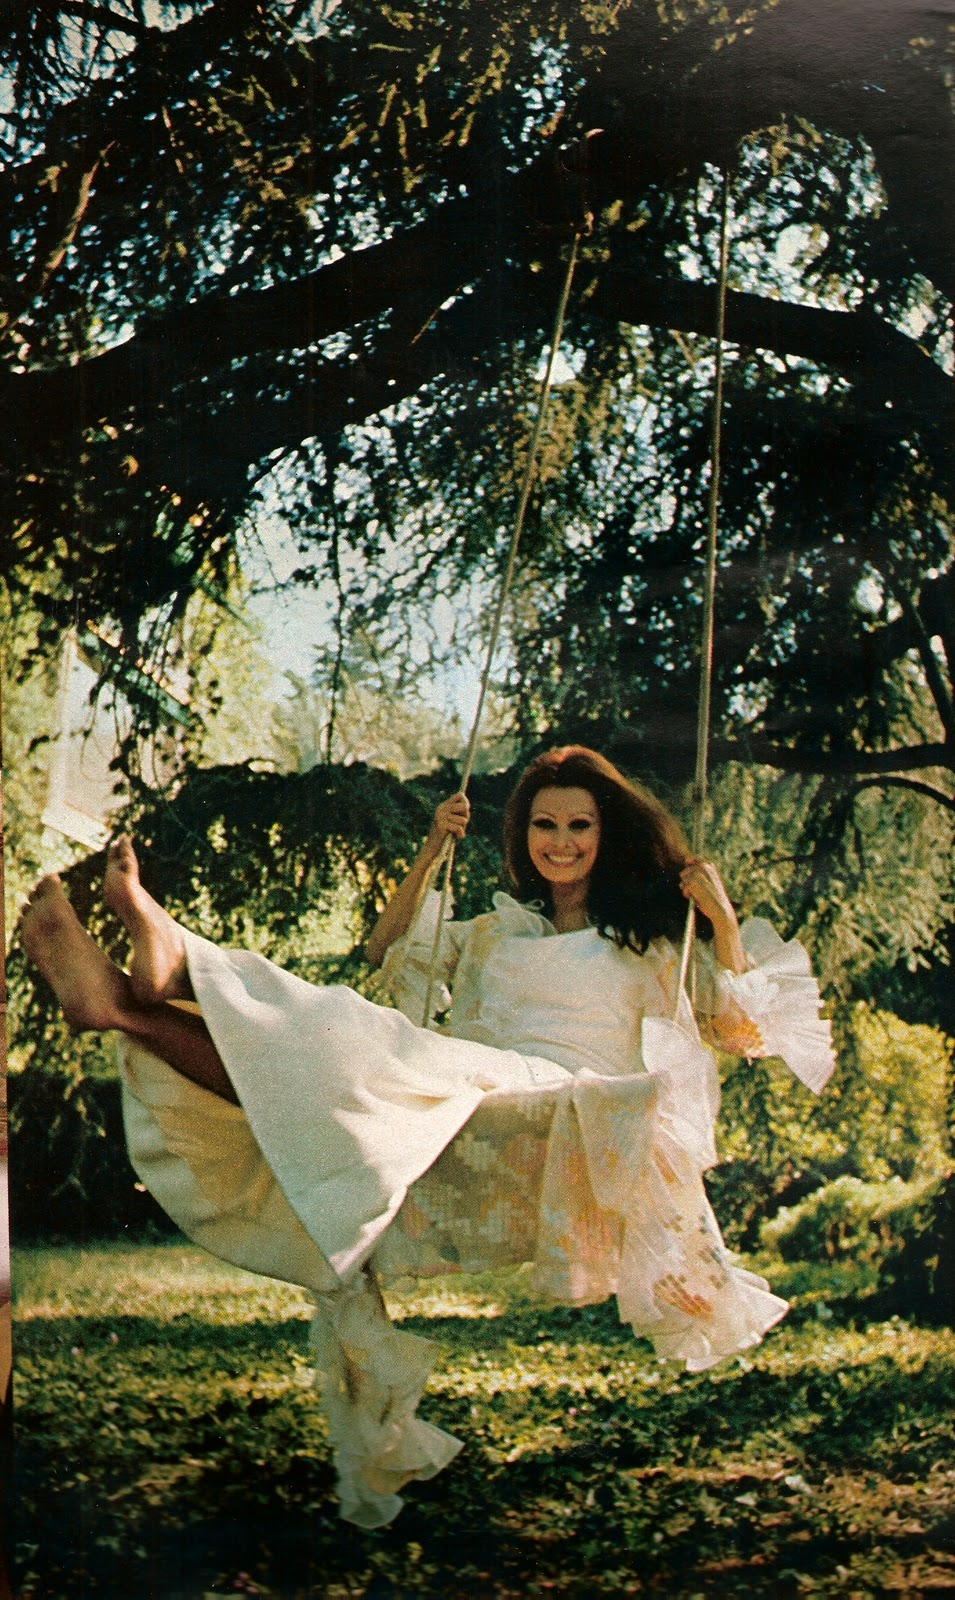 https://pics.wikifeet.com/Sophia-Loren-Feet-688279.jpg